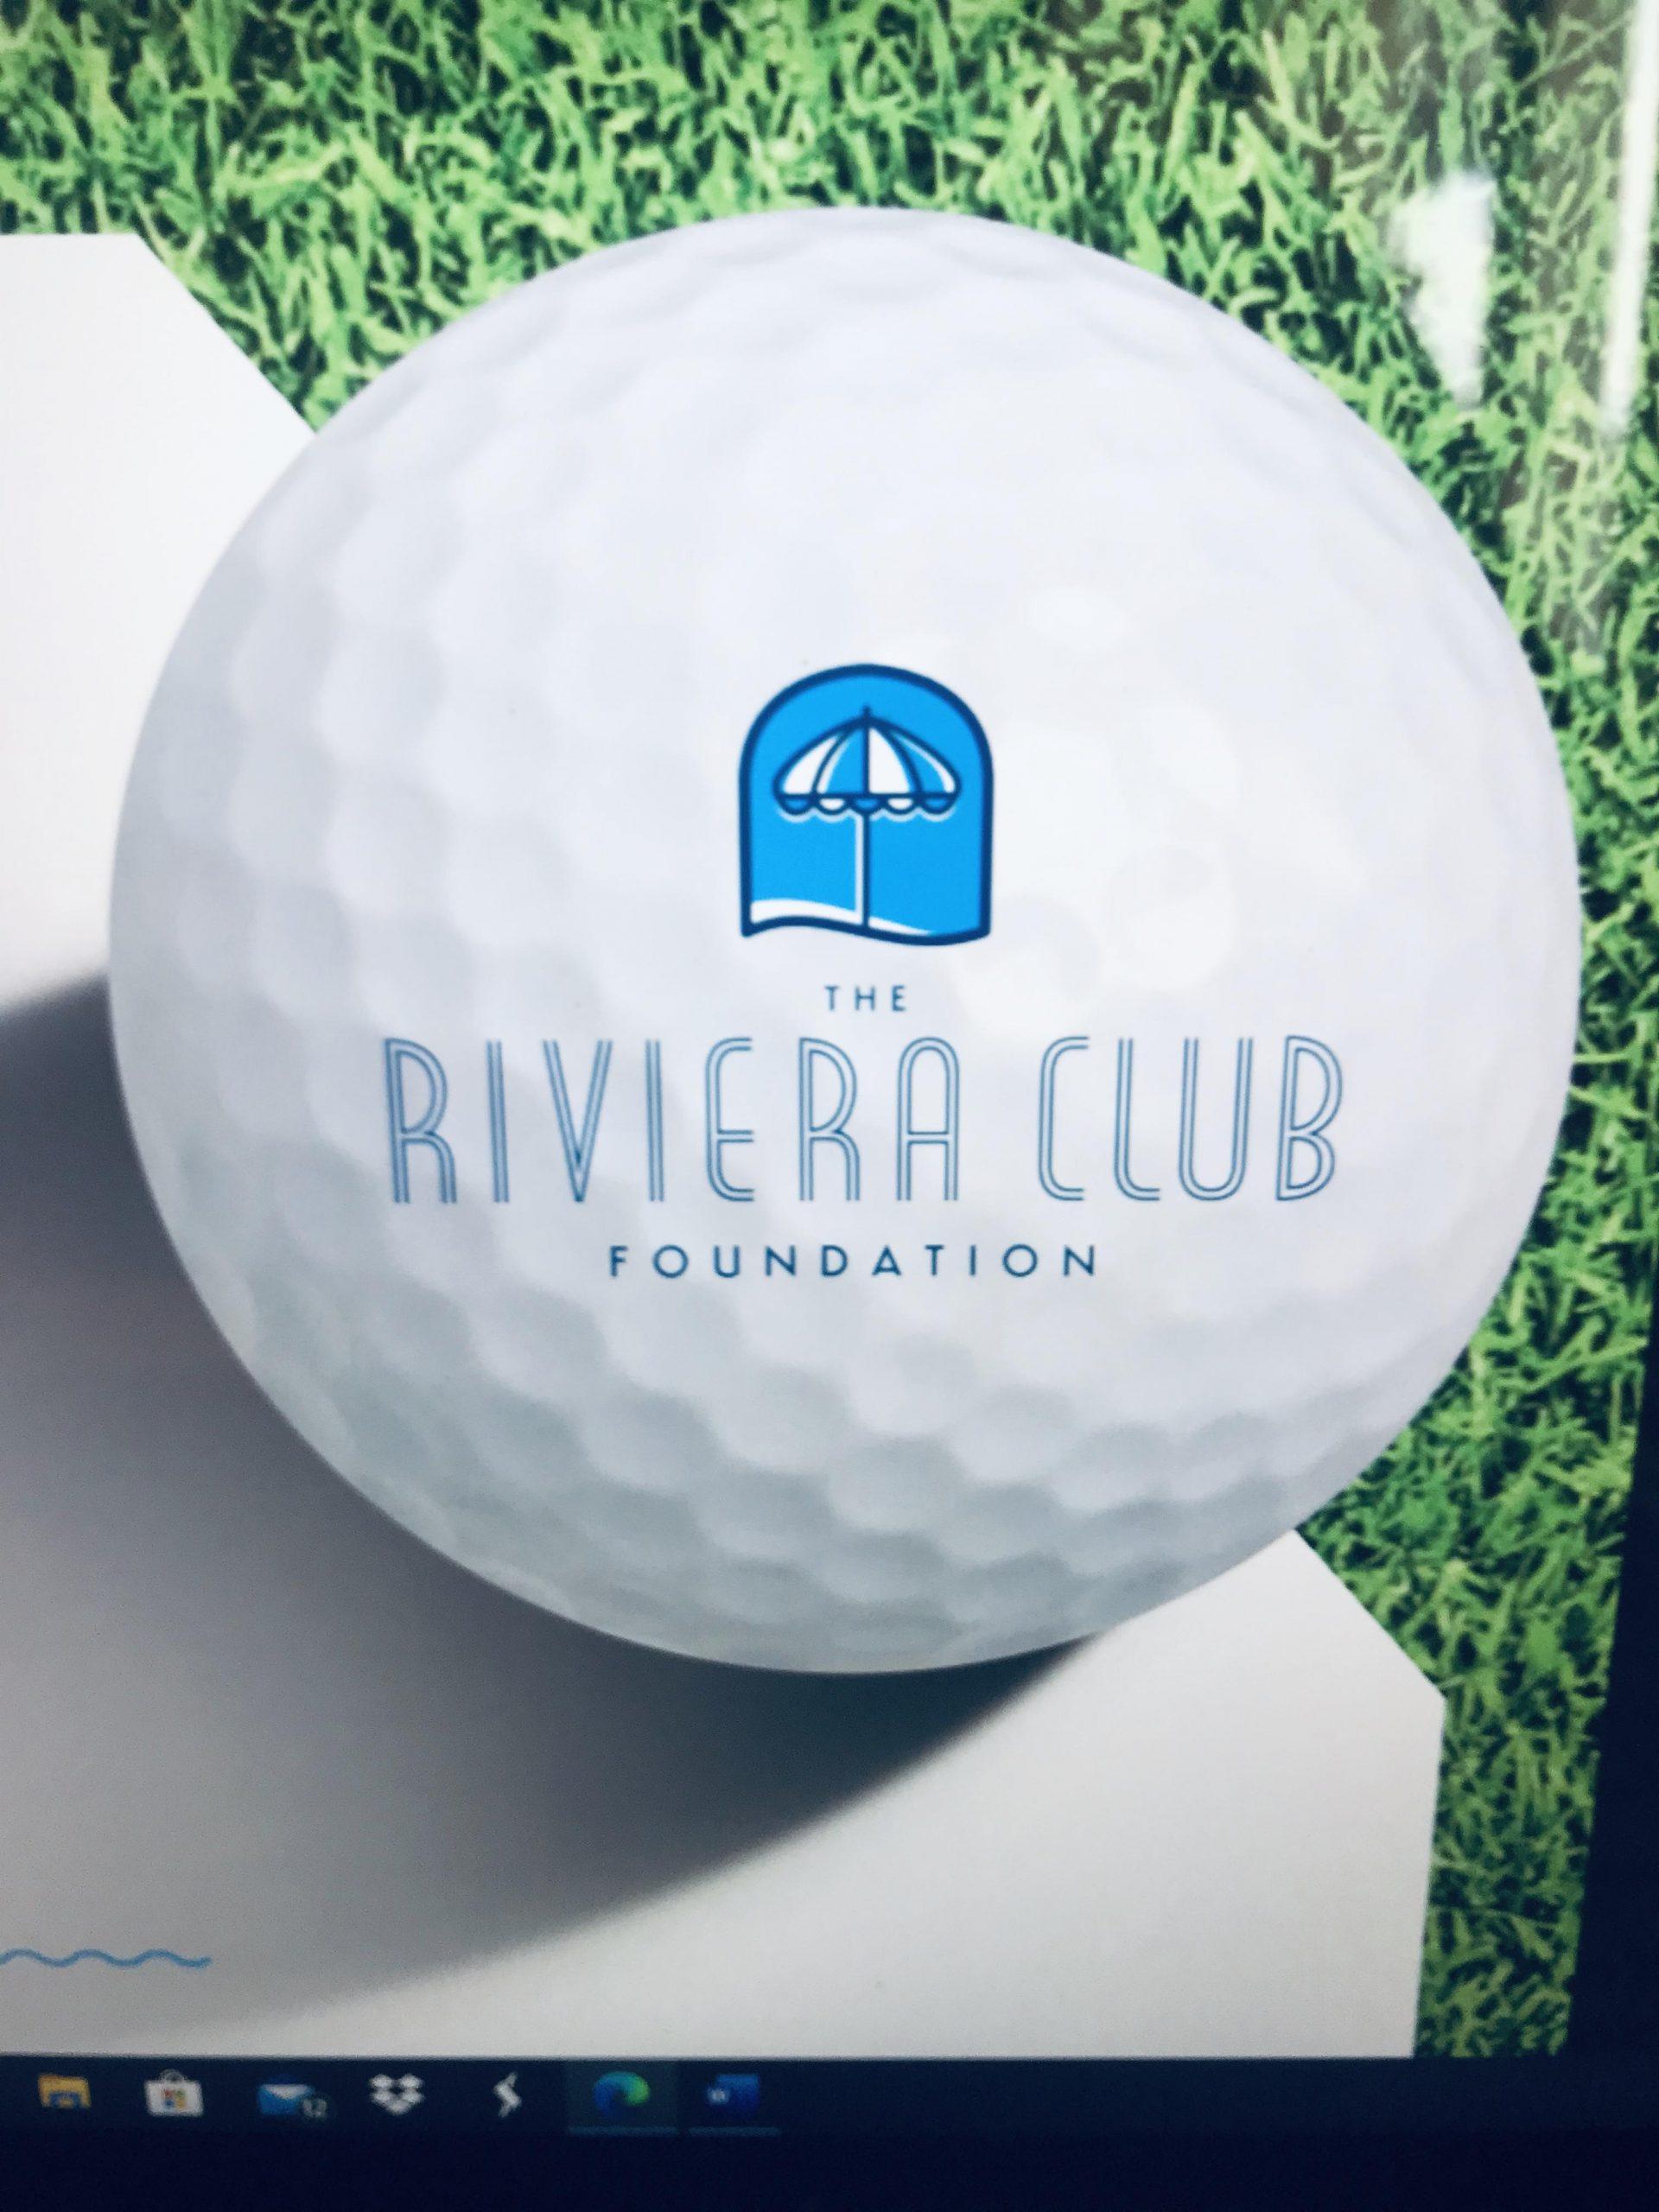 2nd Annual Riviera Club Foundation Golf Fundraiser at Saddlebrook Golf Club